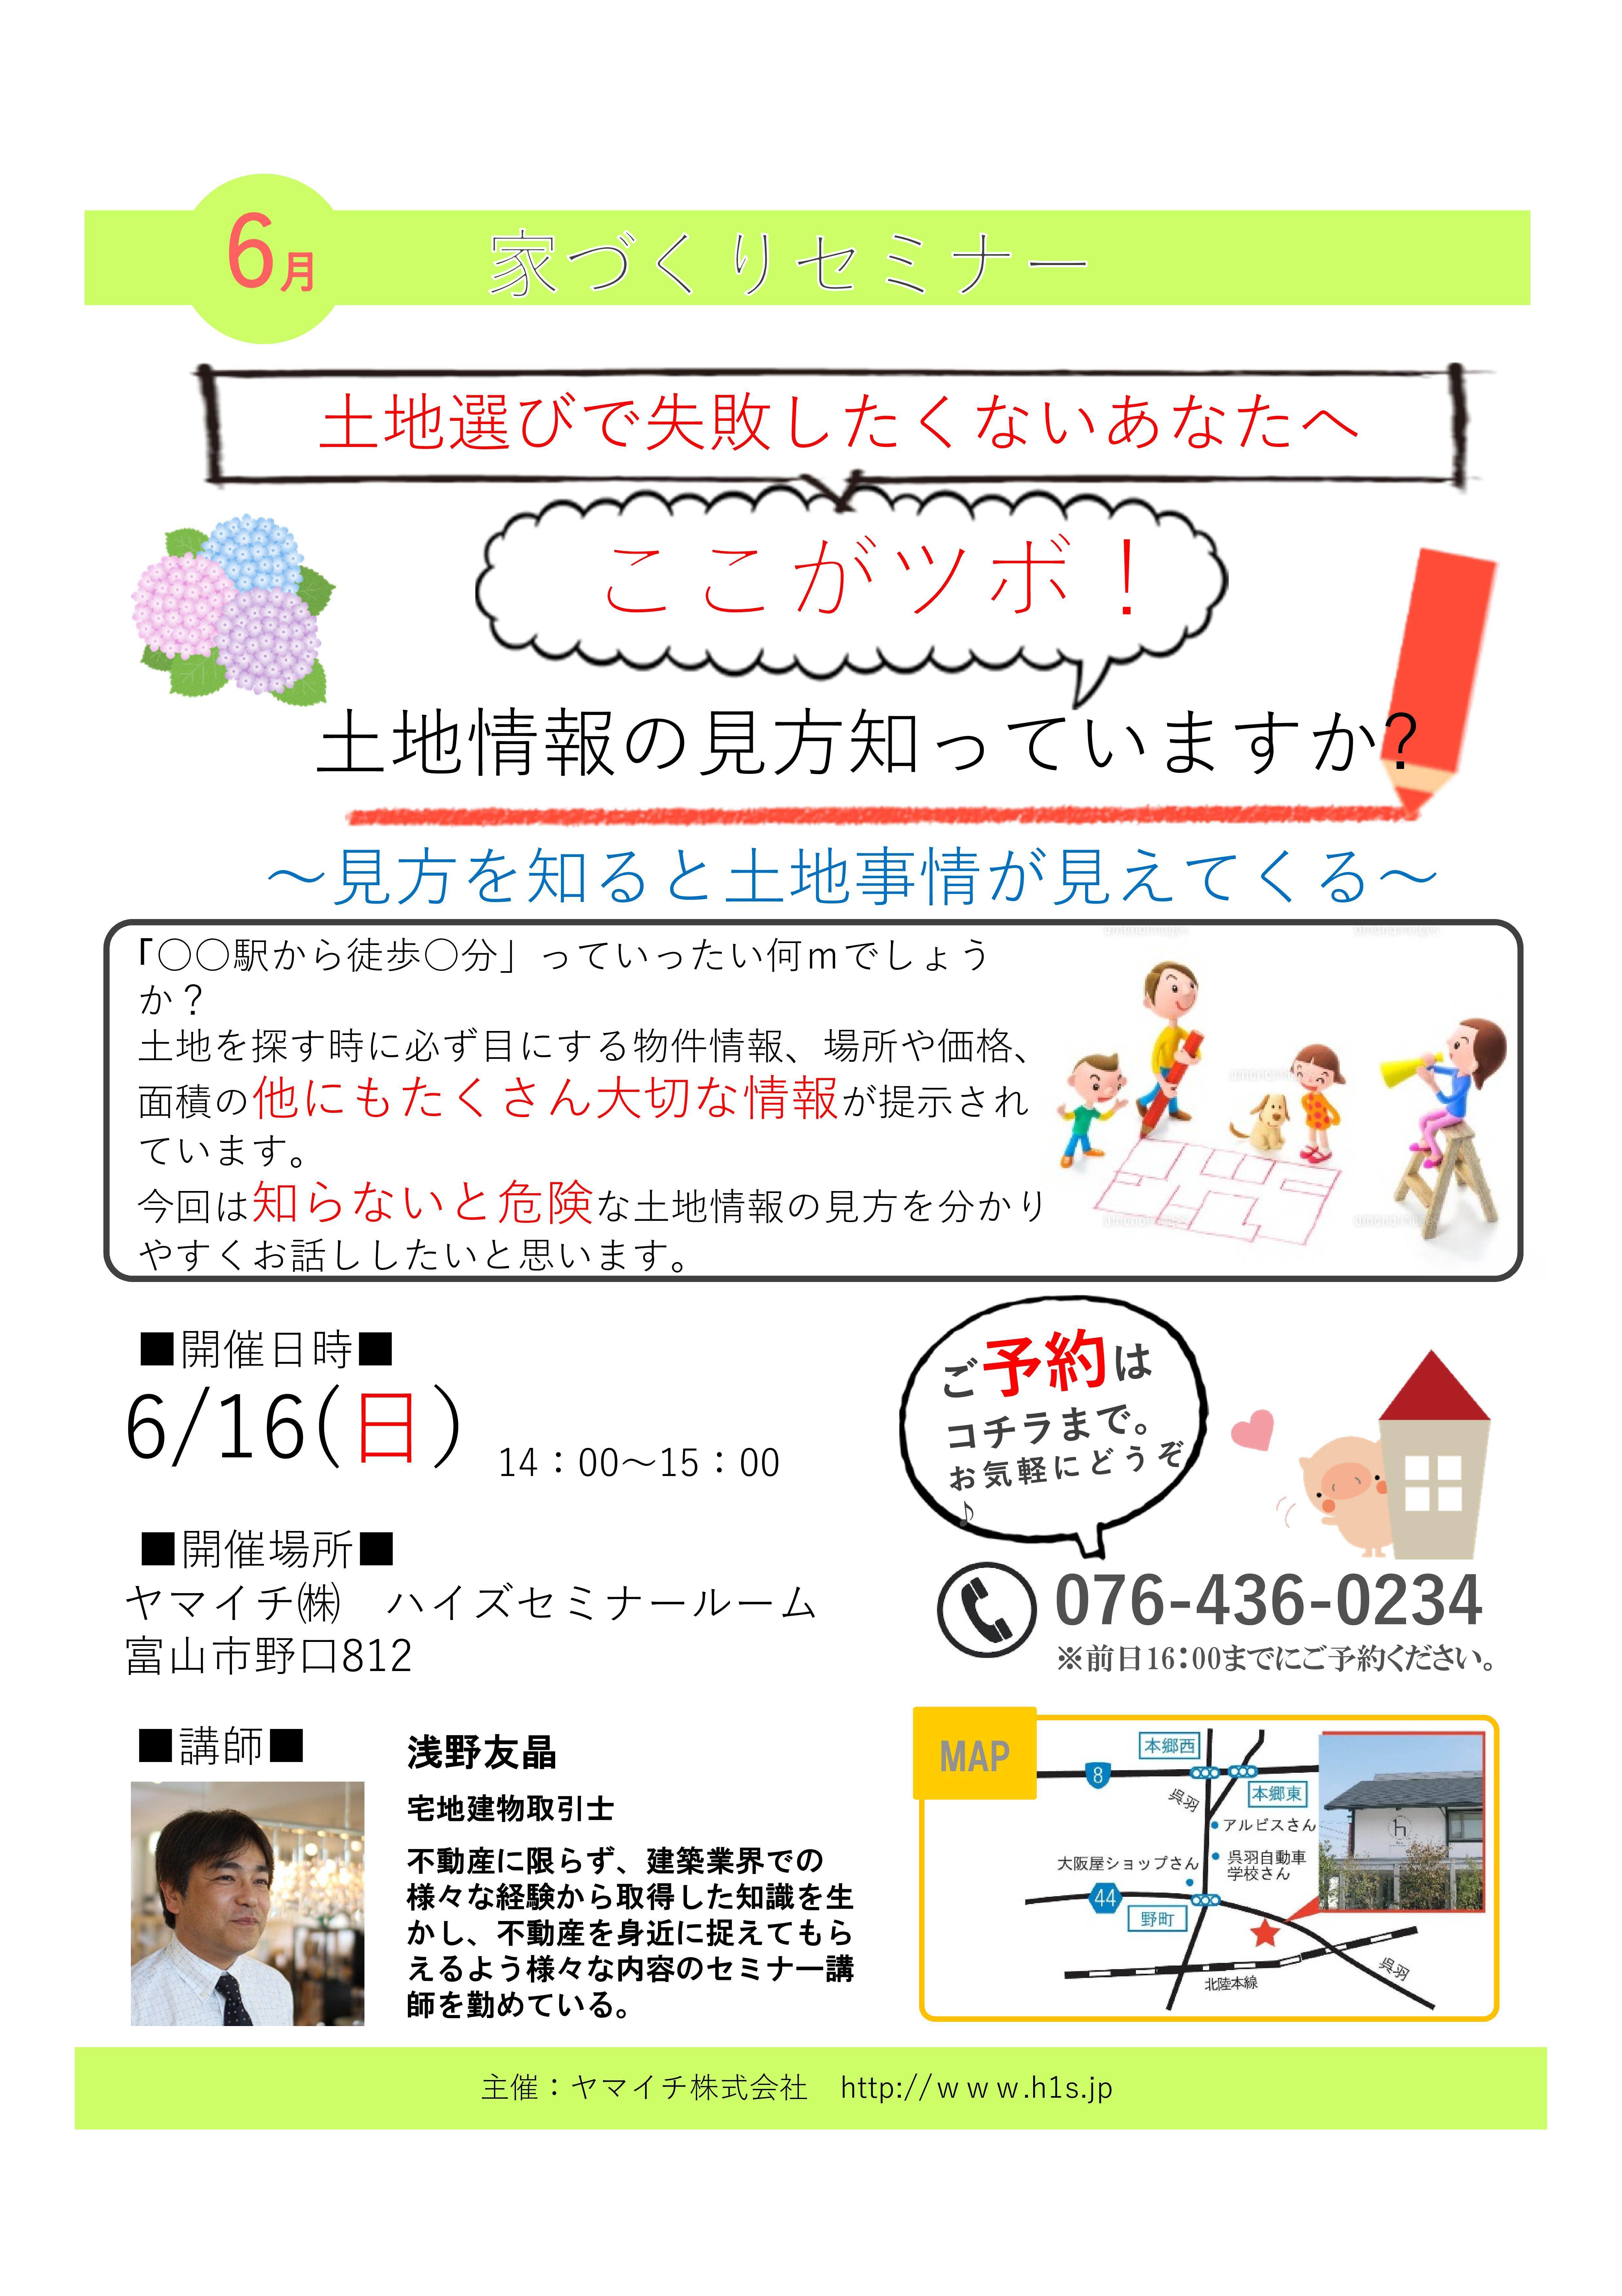 seminar-20190616